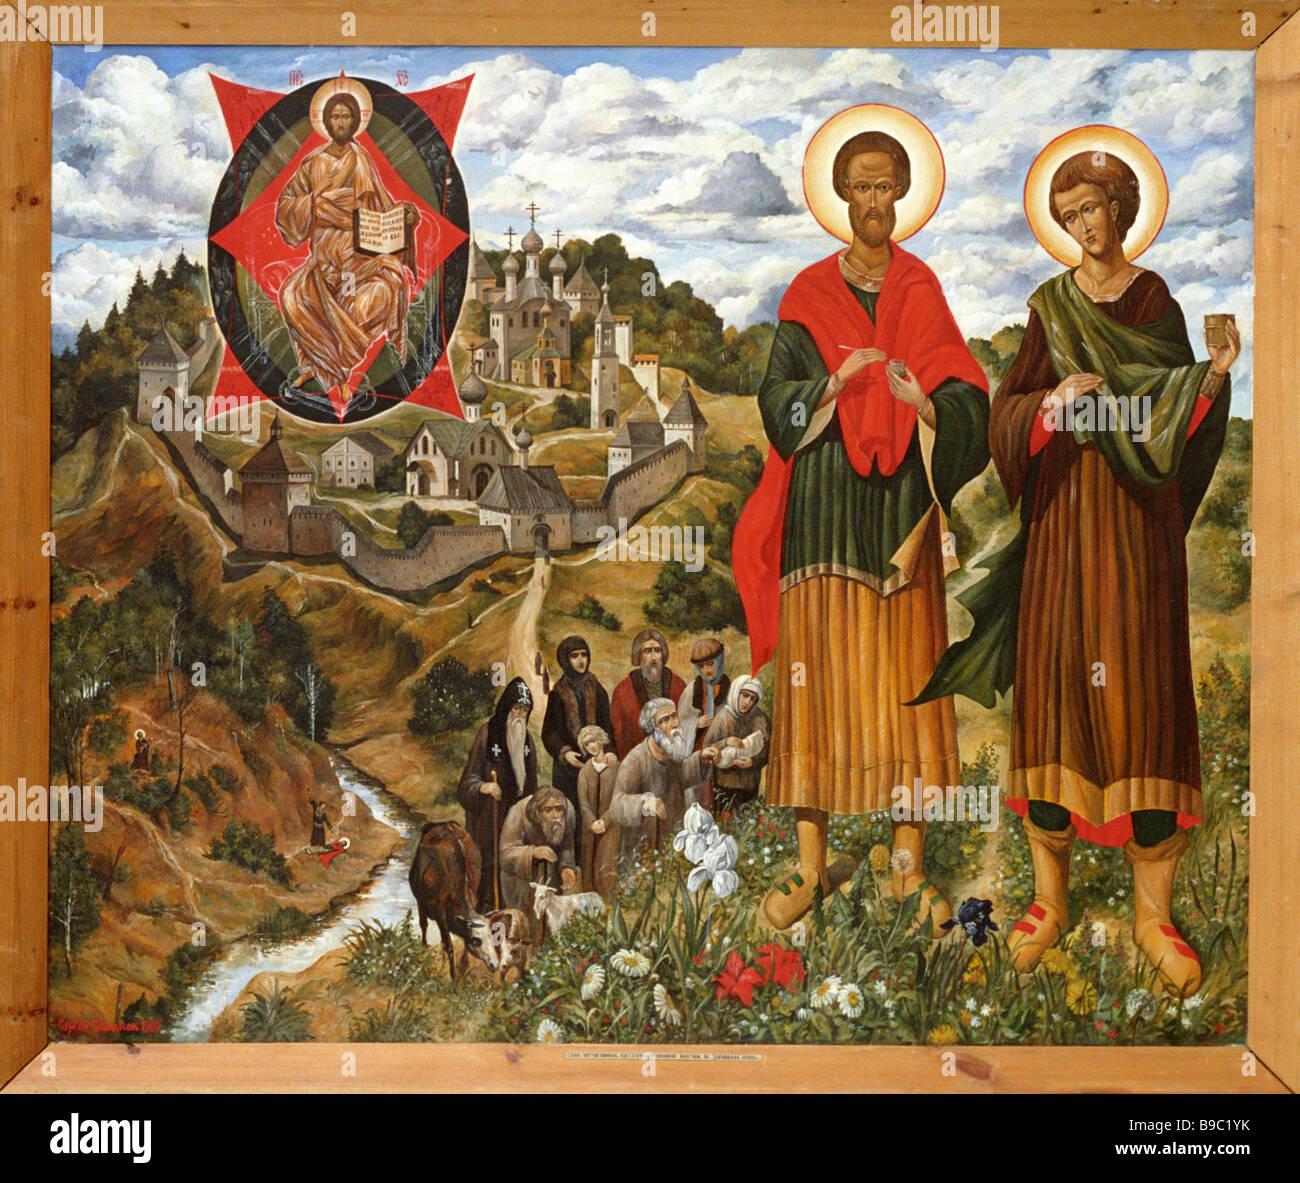 Father Sergius Simakov Sts Cosmas and Damian the Anargyroi Icon 20th century - Stock Image